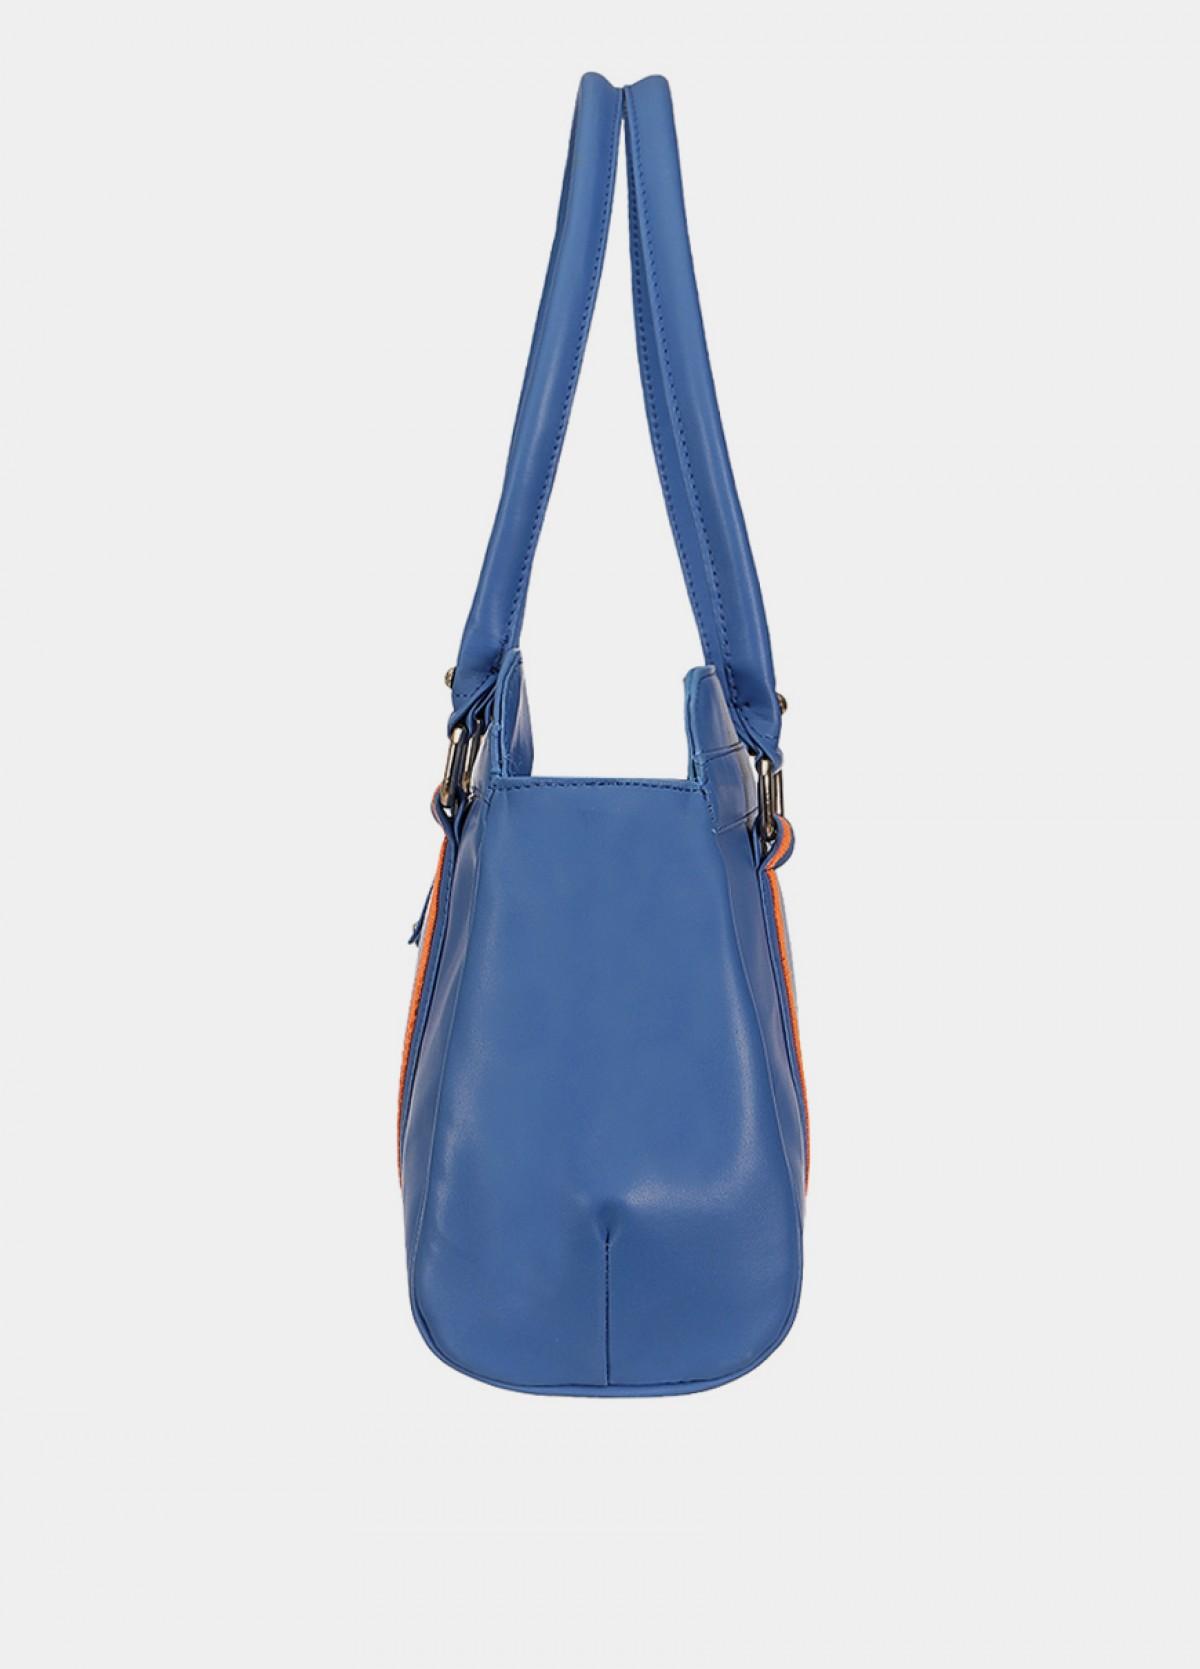 The Satyapaul Women Fashion Blue Hand Bag